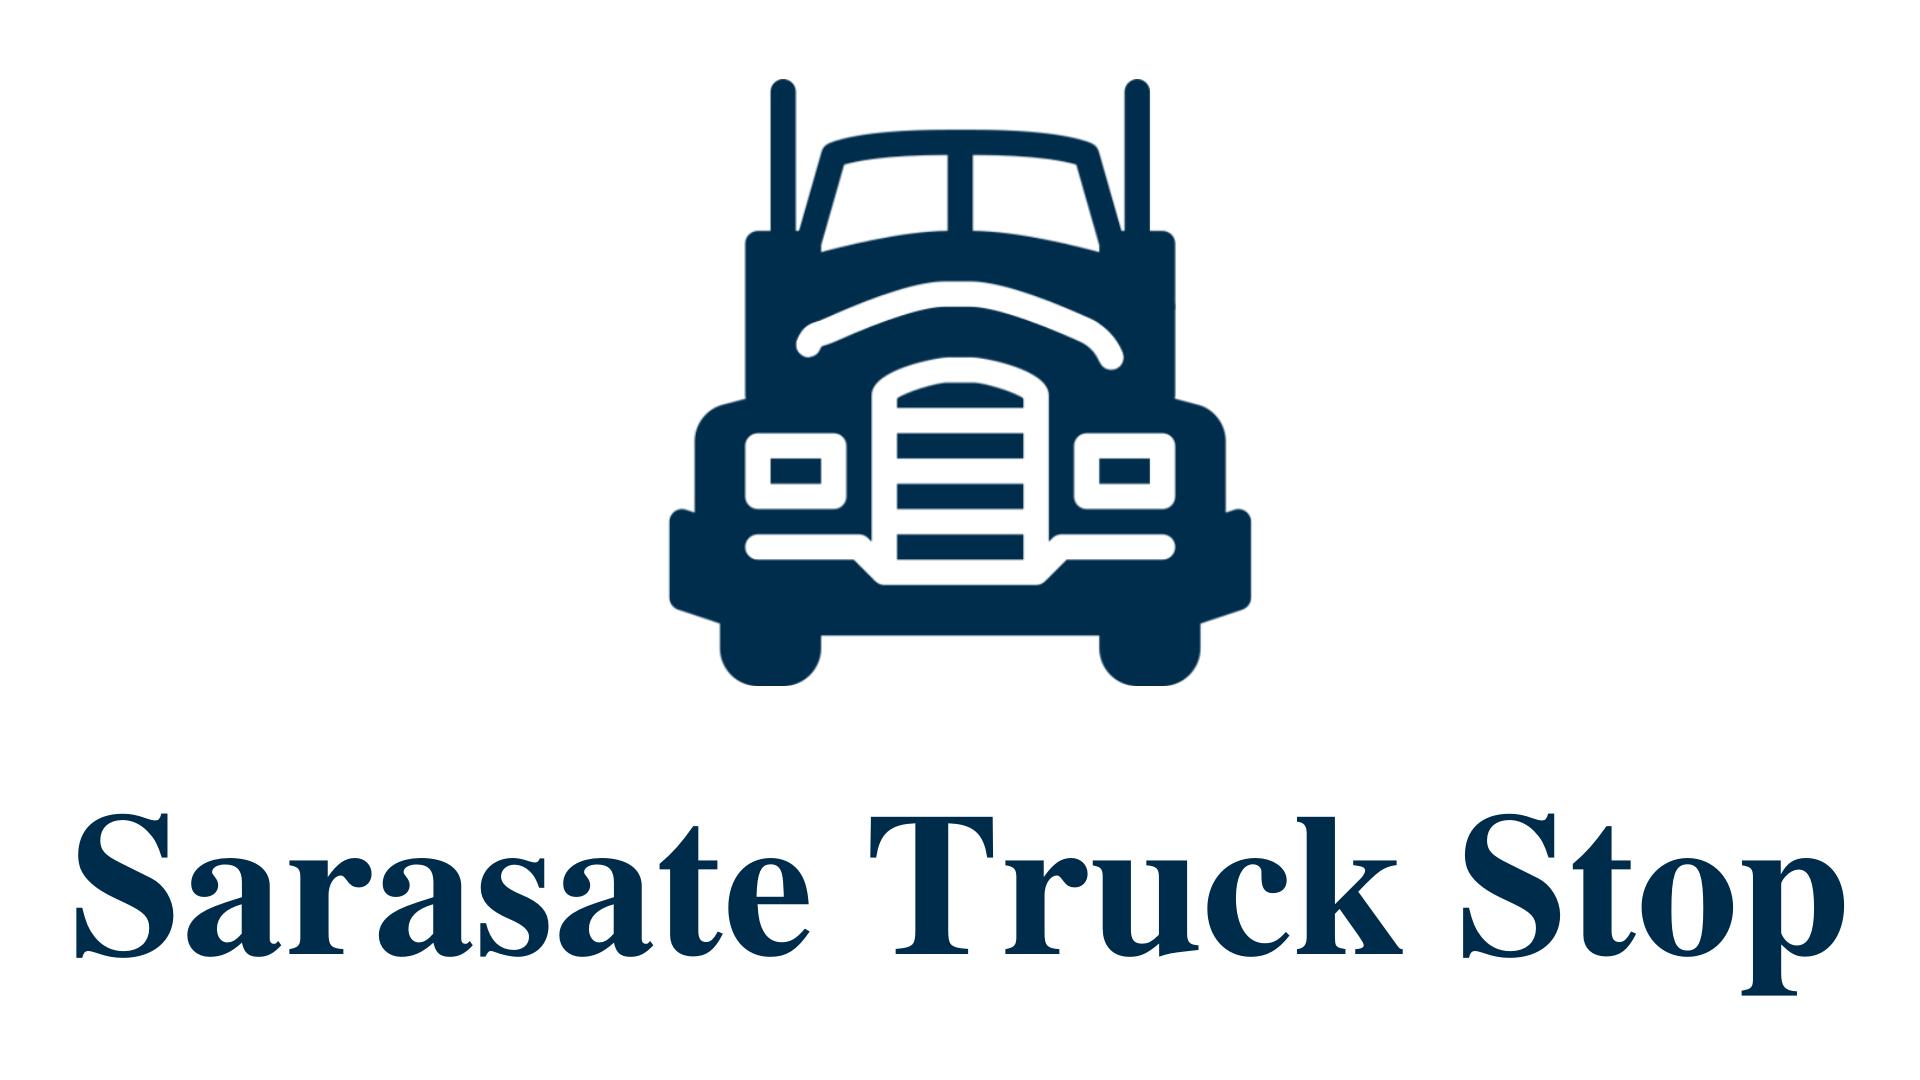 Sarasate Truck Stop